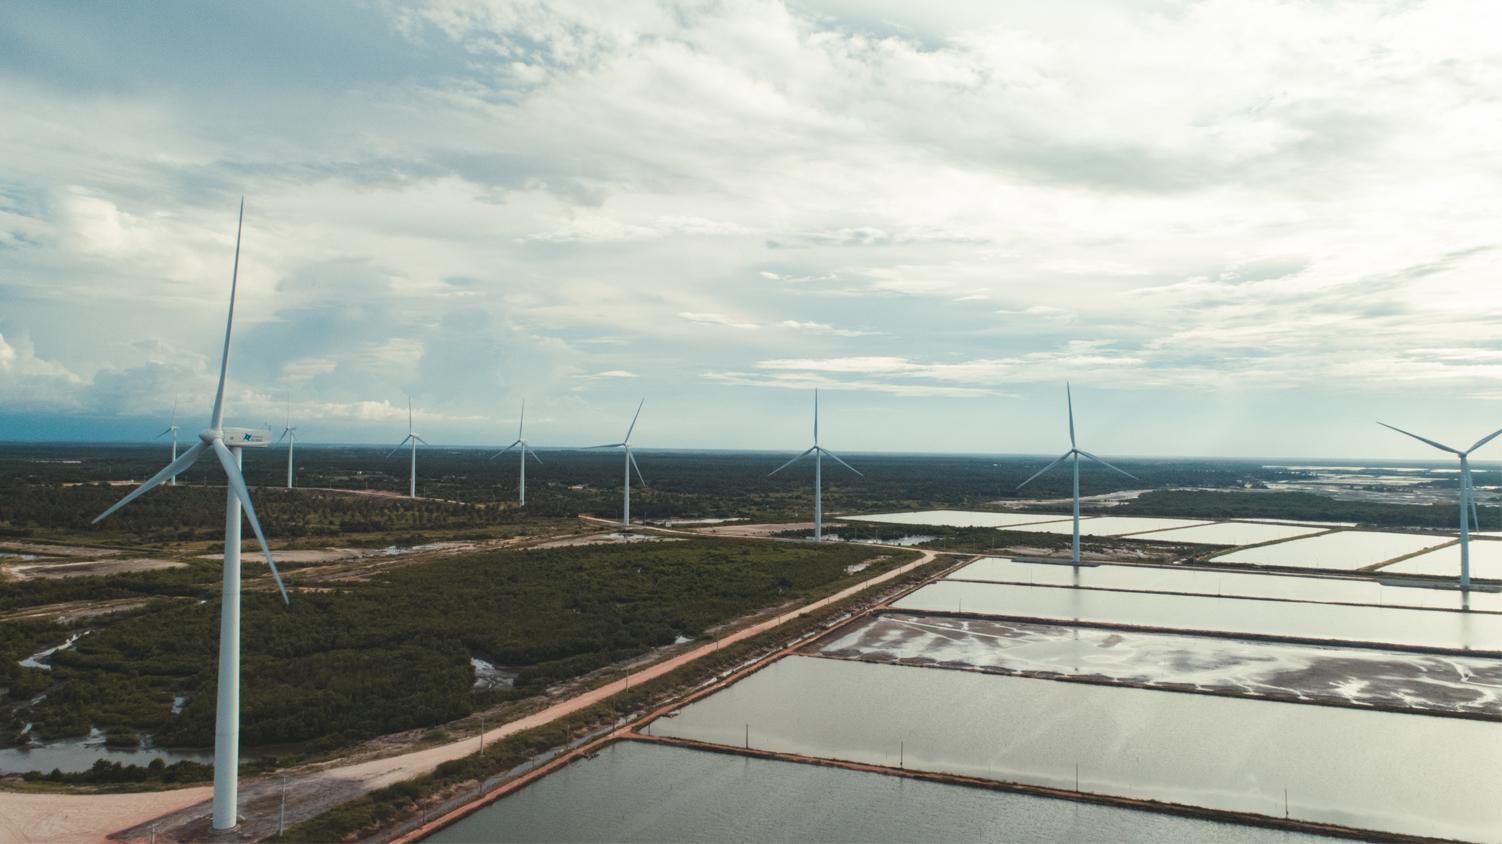 heineken inaugura parque eólico ceará diminuir emissão CO2